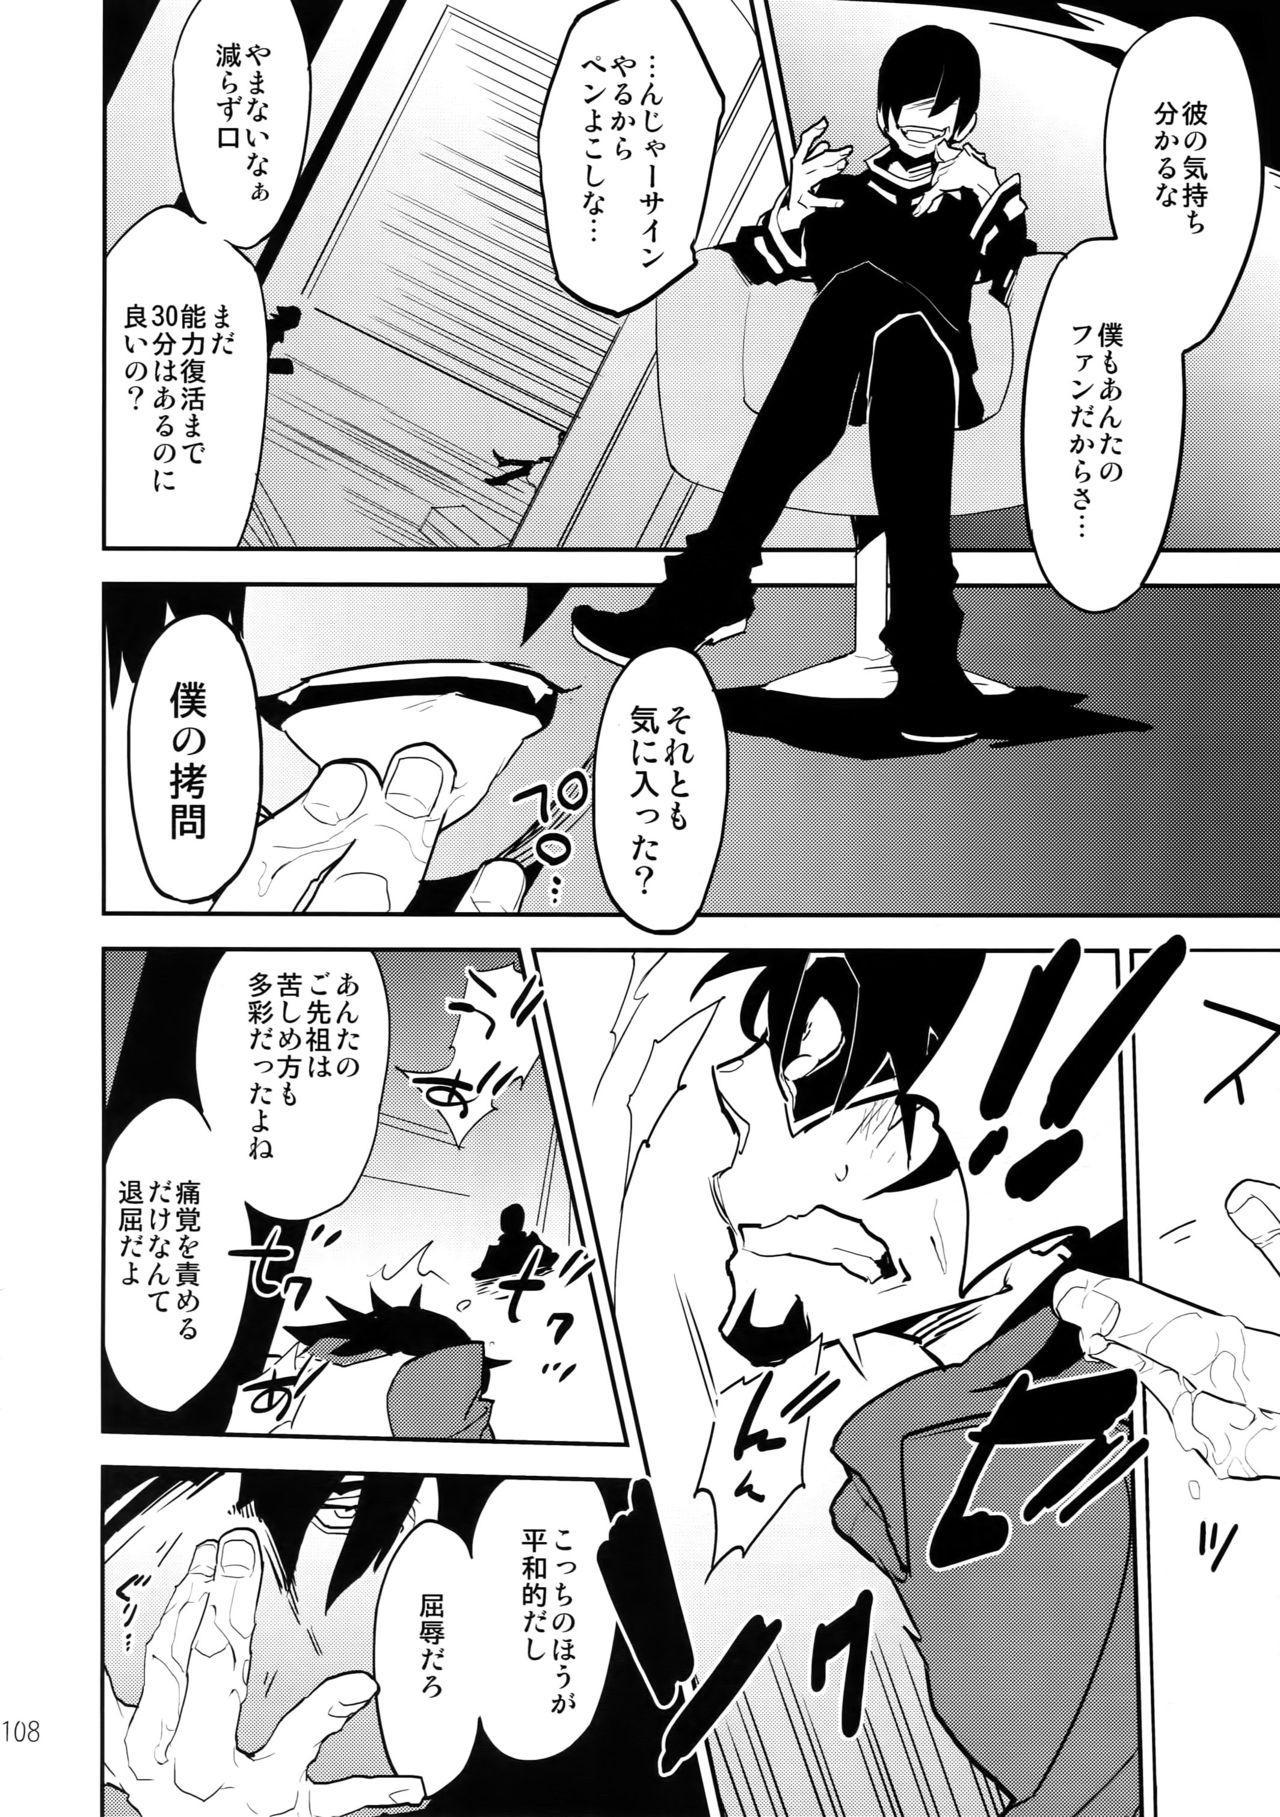 T&B Sairoku! 2 106